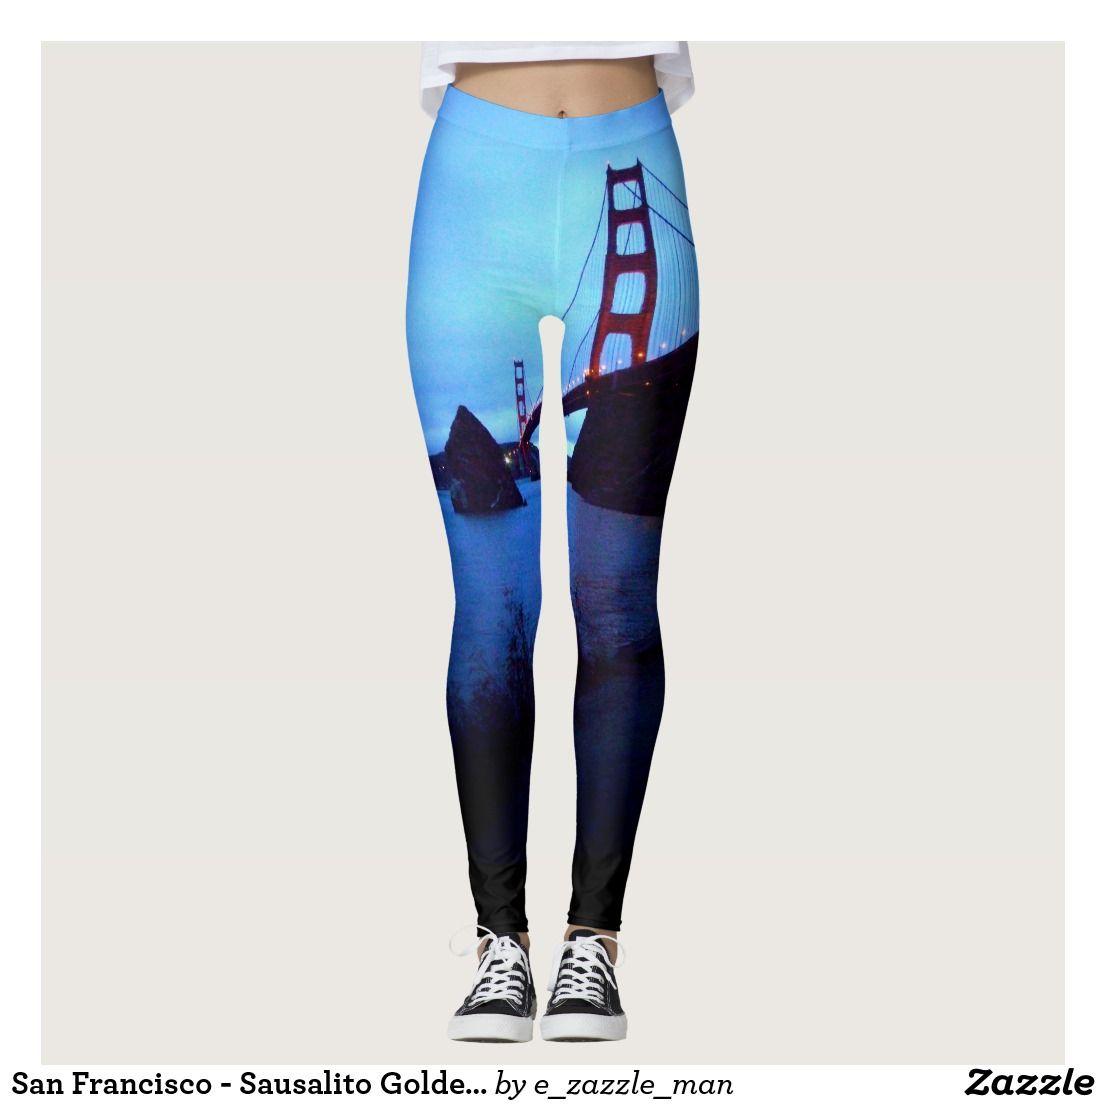 San Francisco Sausalito Golden Gate Bridge Leggings Zazzle Com Leggings Are Not Pants Custom Leggings Leggings